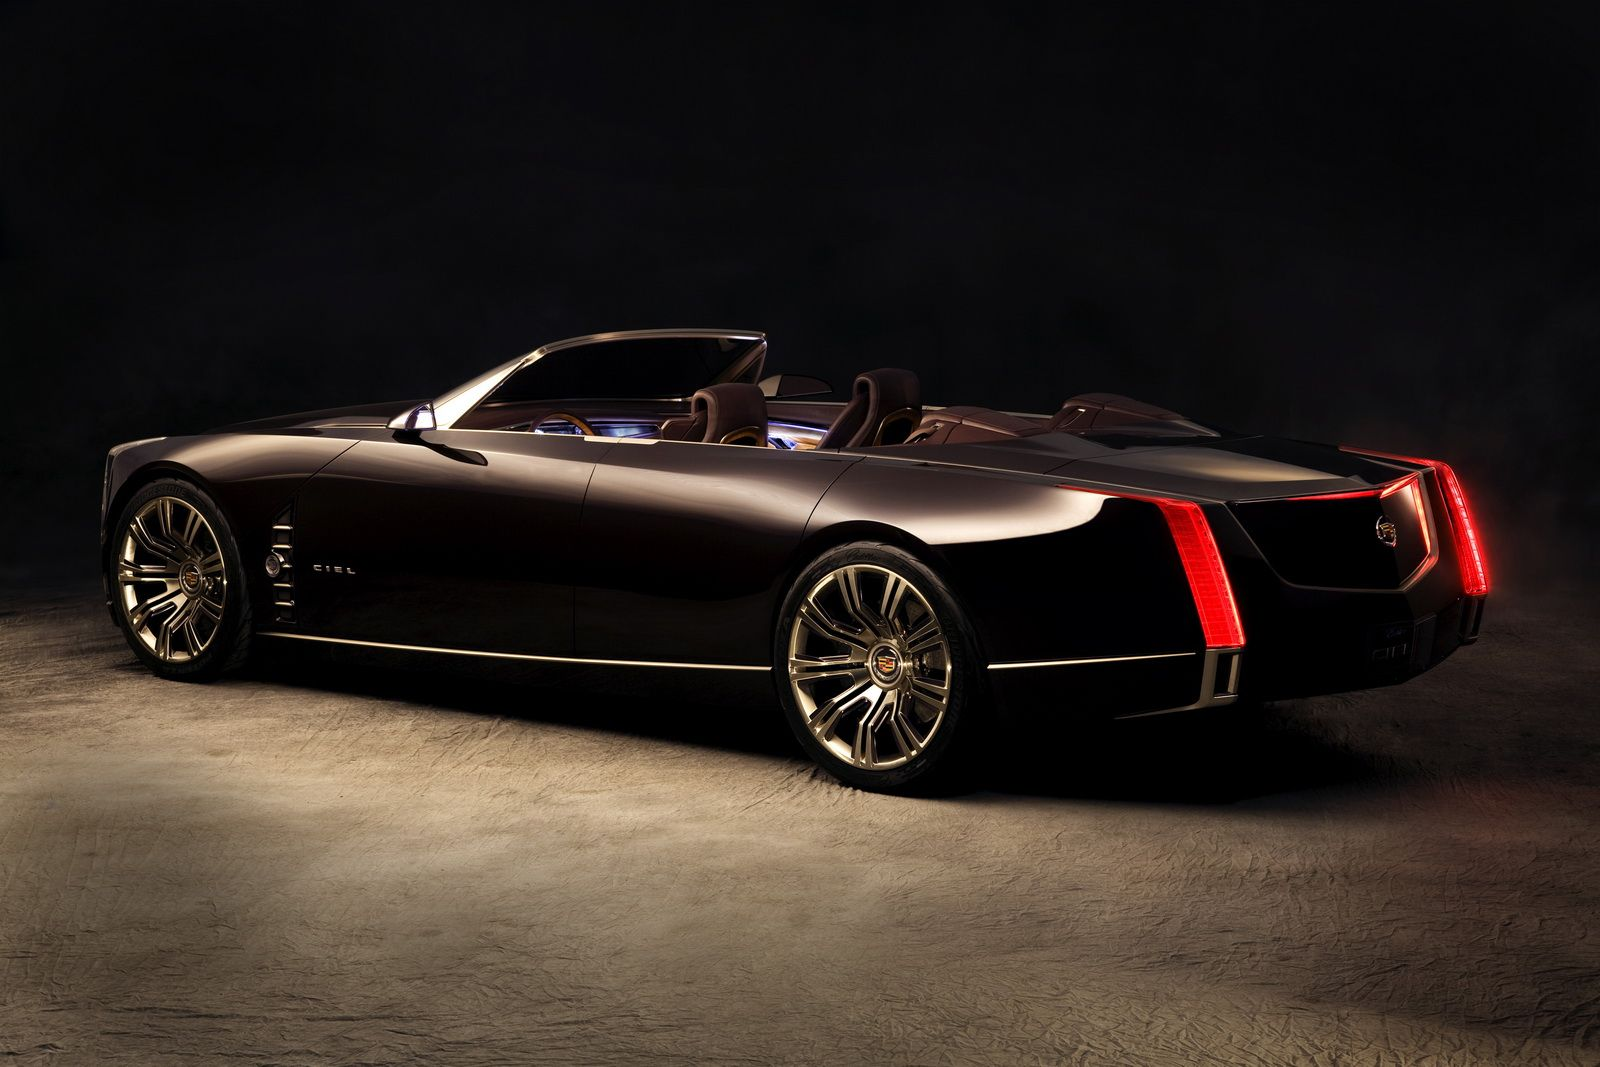 New Cadillac Ciel 4 Door Convertible Concept Wows Pebble Beach Crowd